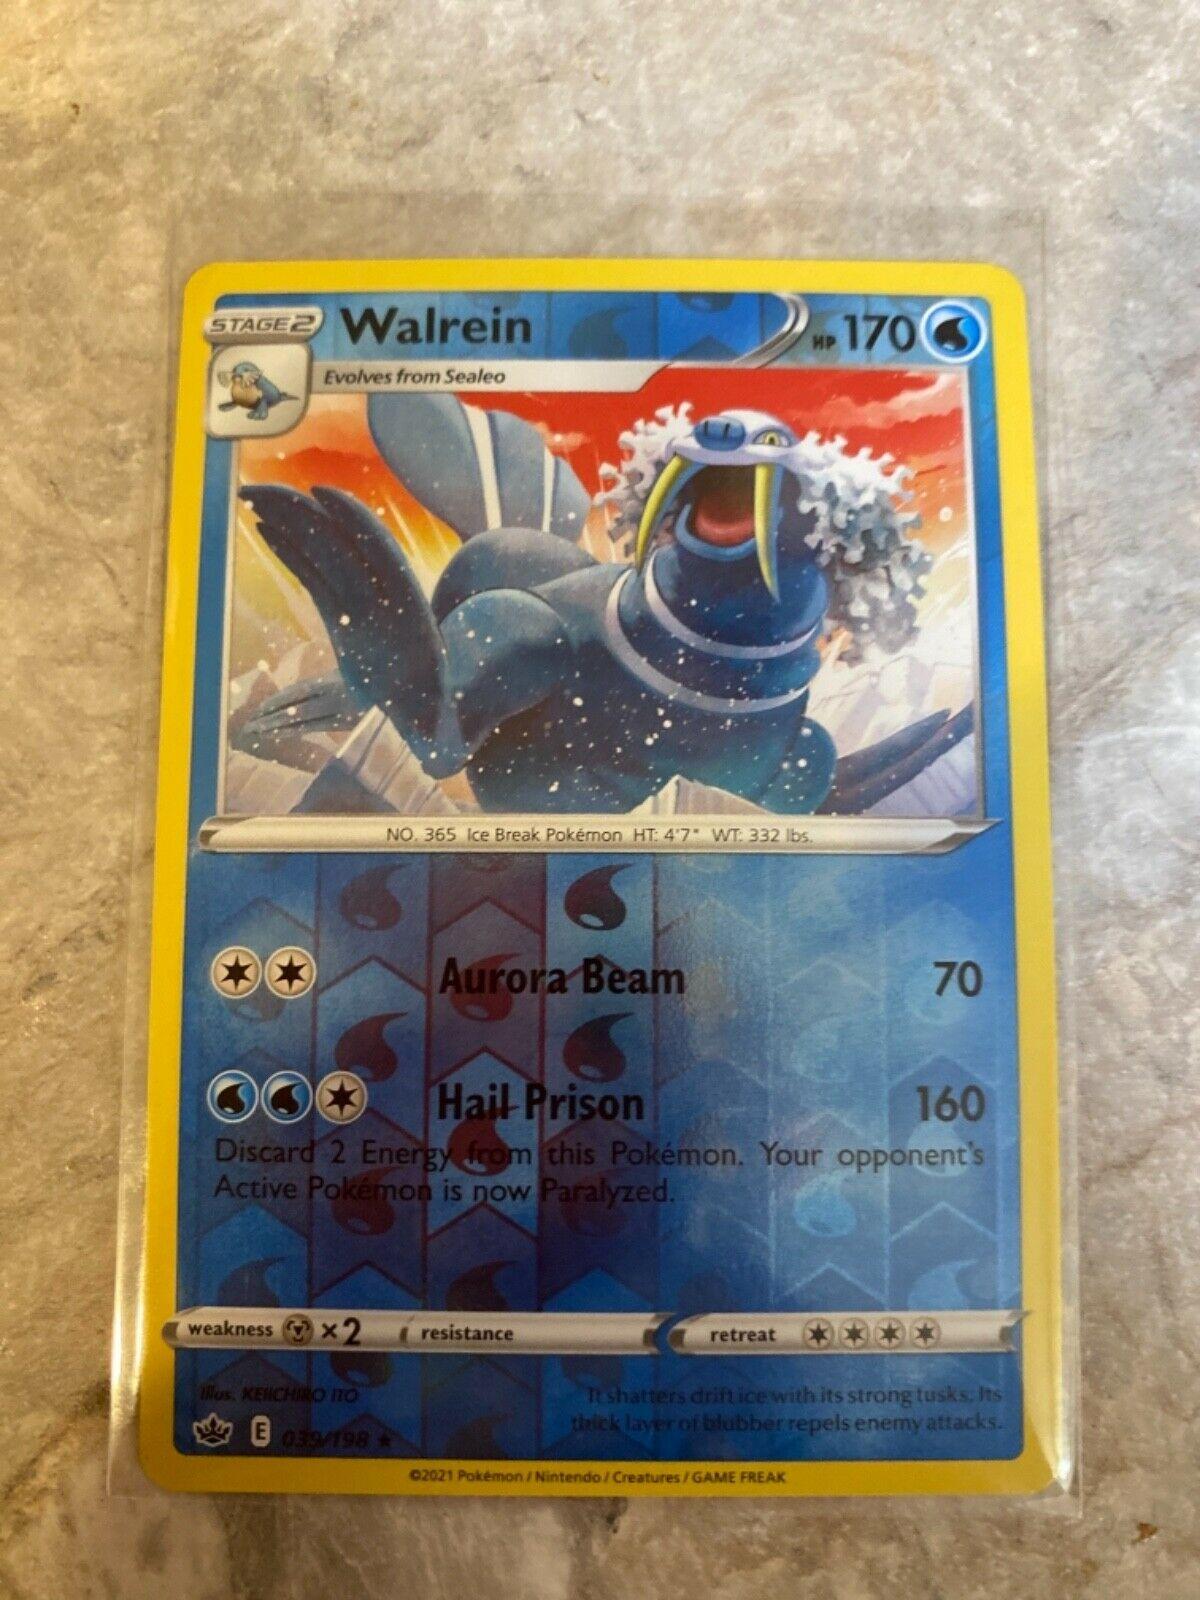 x1 Walrein - 039/198 - Rare - Reverse Holo Pokemon Chilling Reign 39/198 MINT!